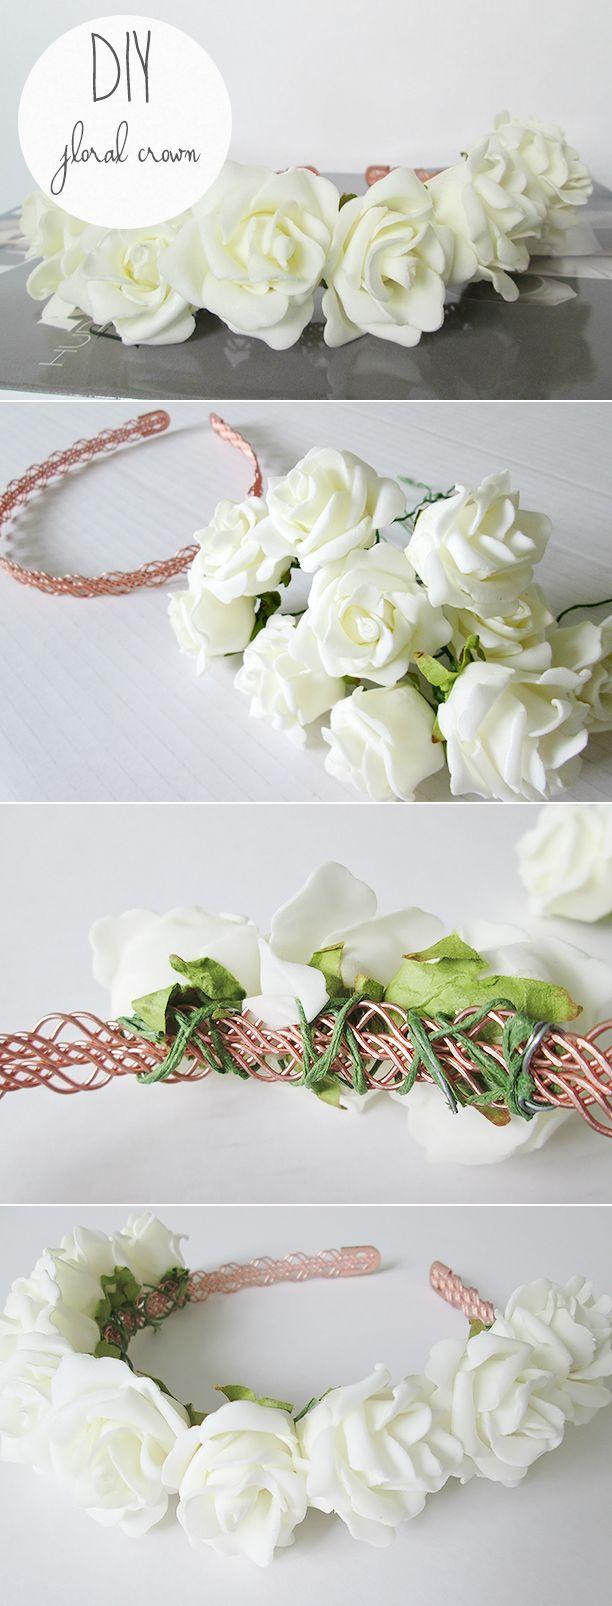 DIY Floral Crown - Nouvelle Daily